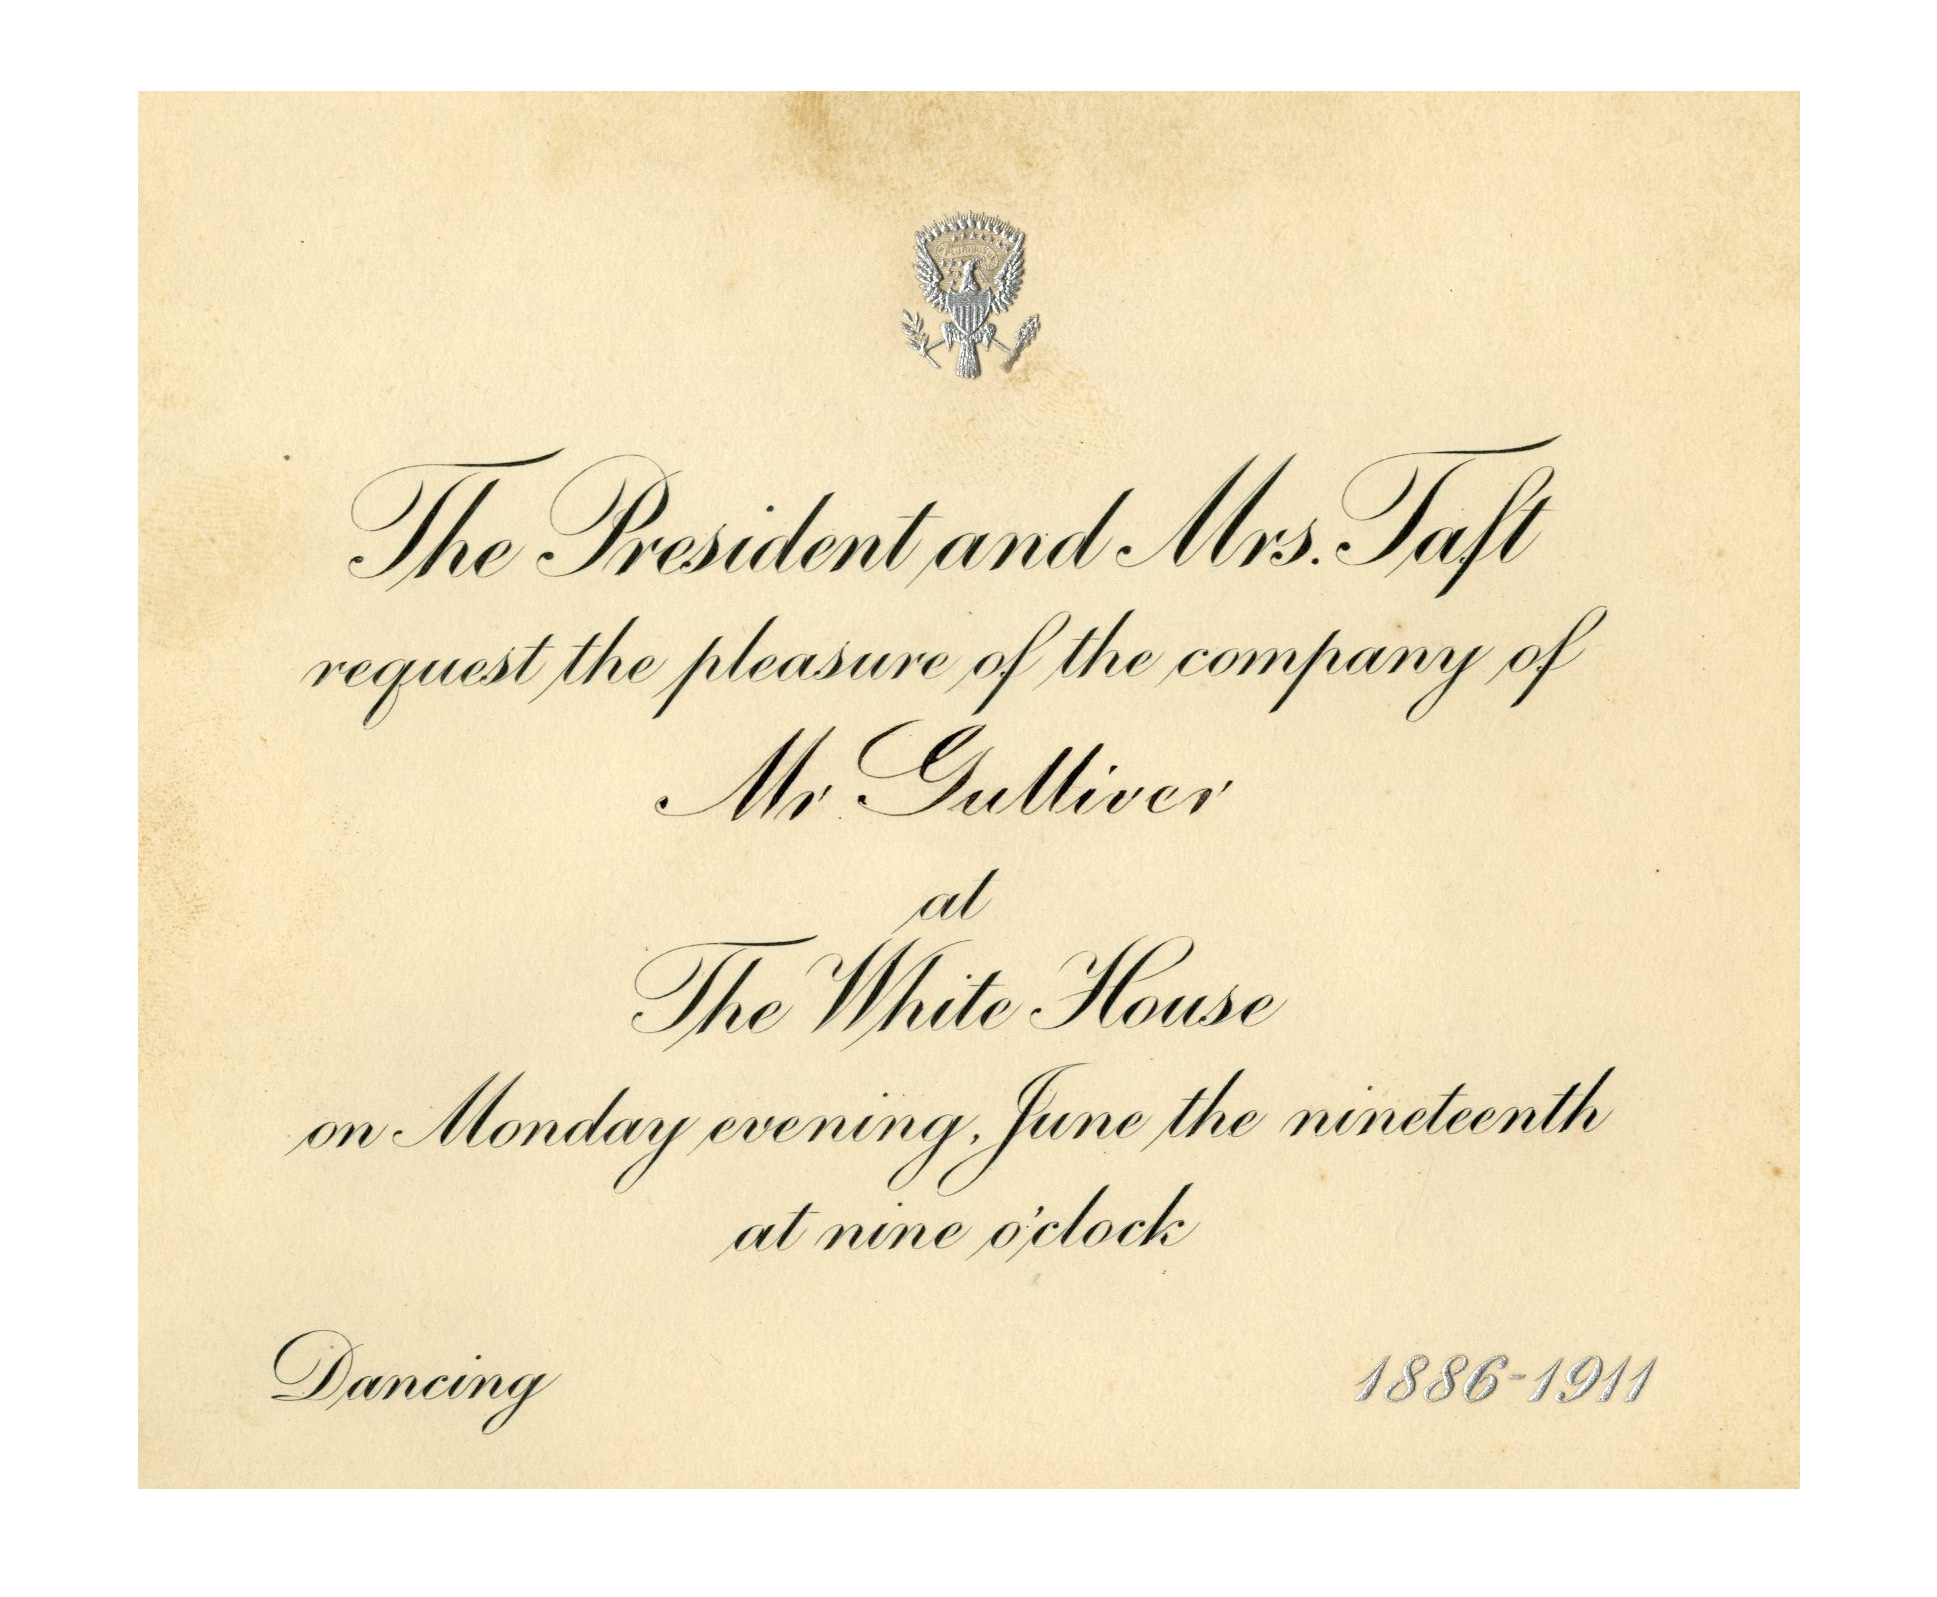 White House Wedding Invitation - Wedding Dress Ideas And Design